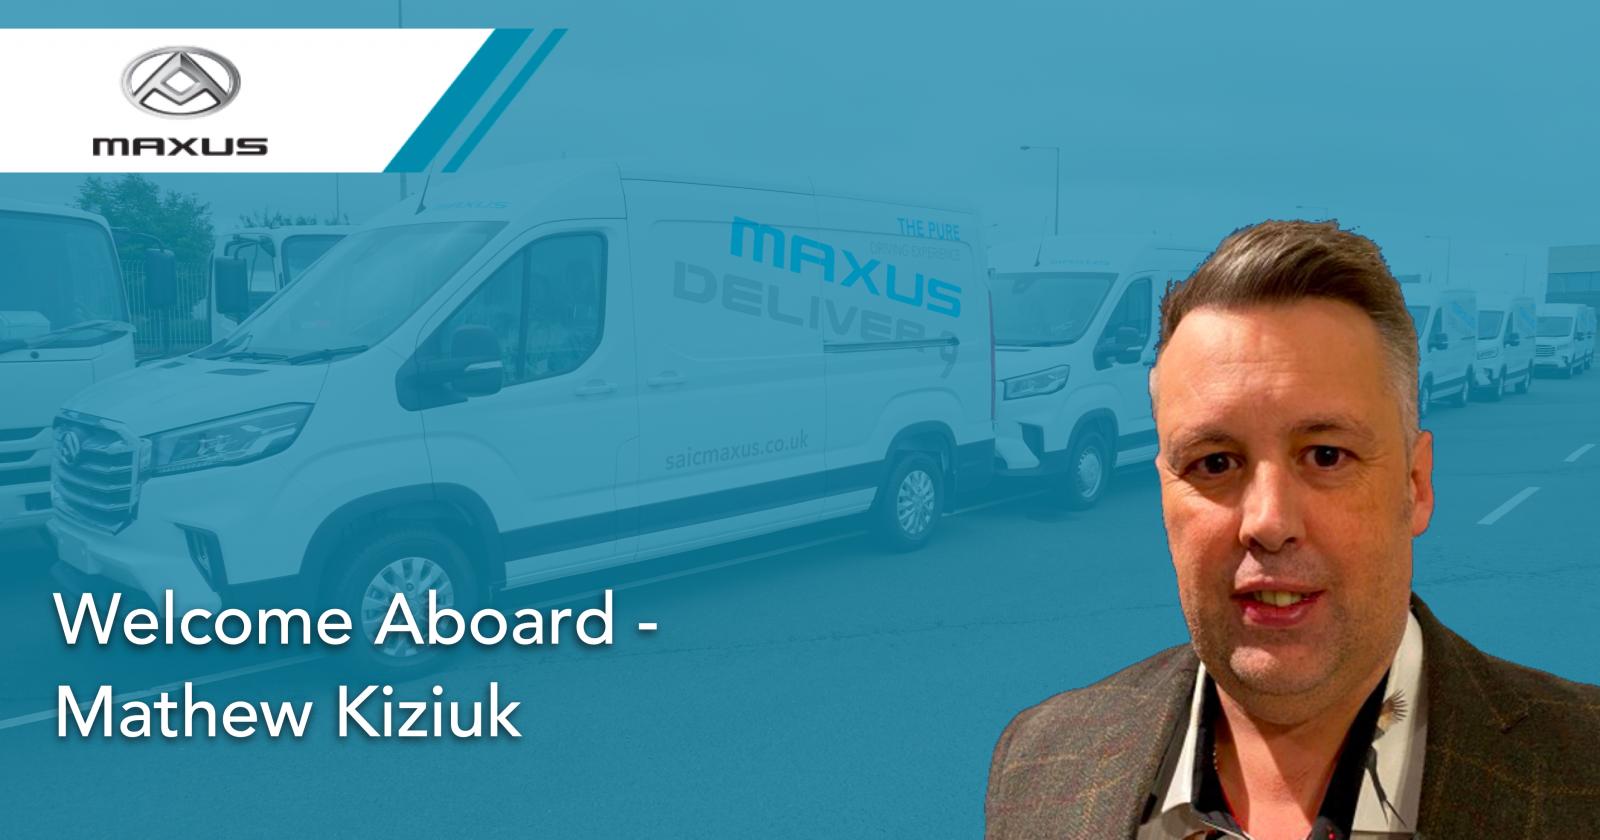 Matthew Kiziuk New Northern Regional Manager for Fleet Sales and Dealer Development at MAXUS UK